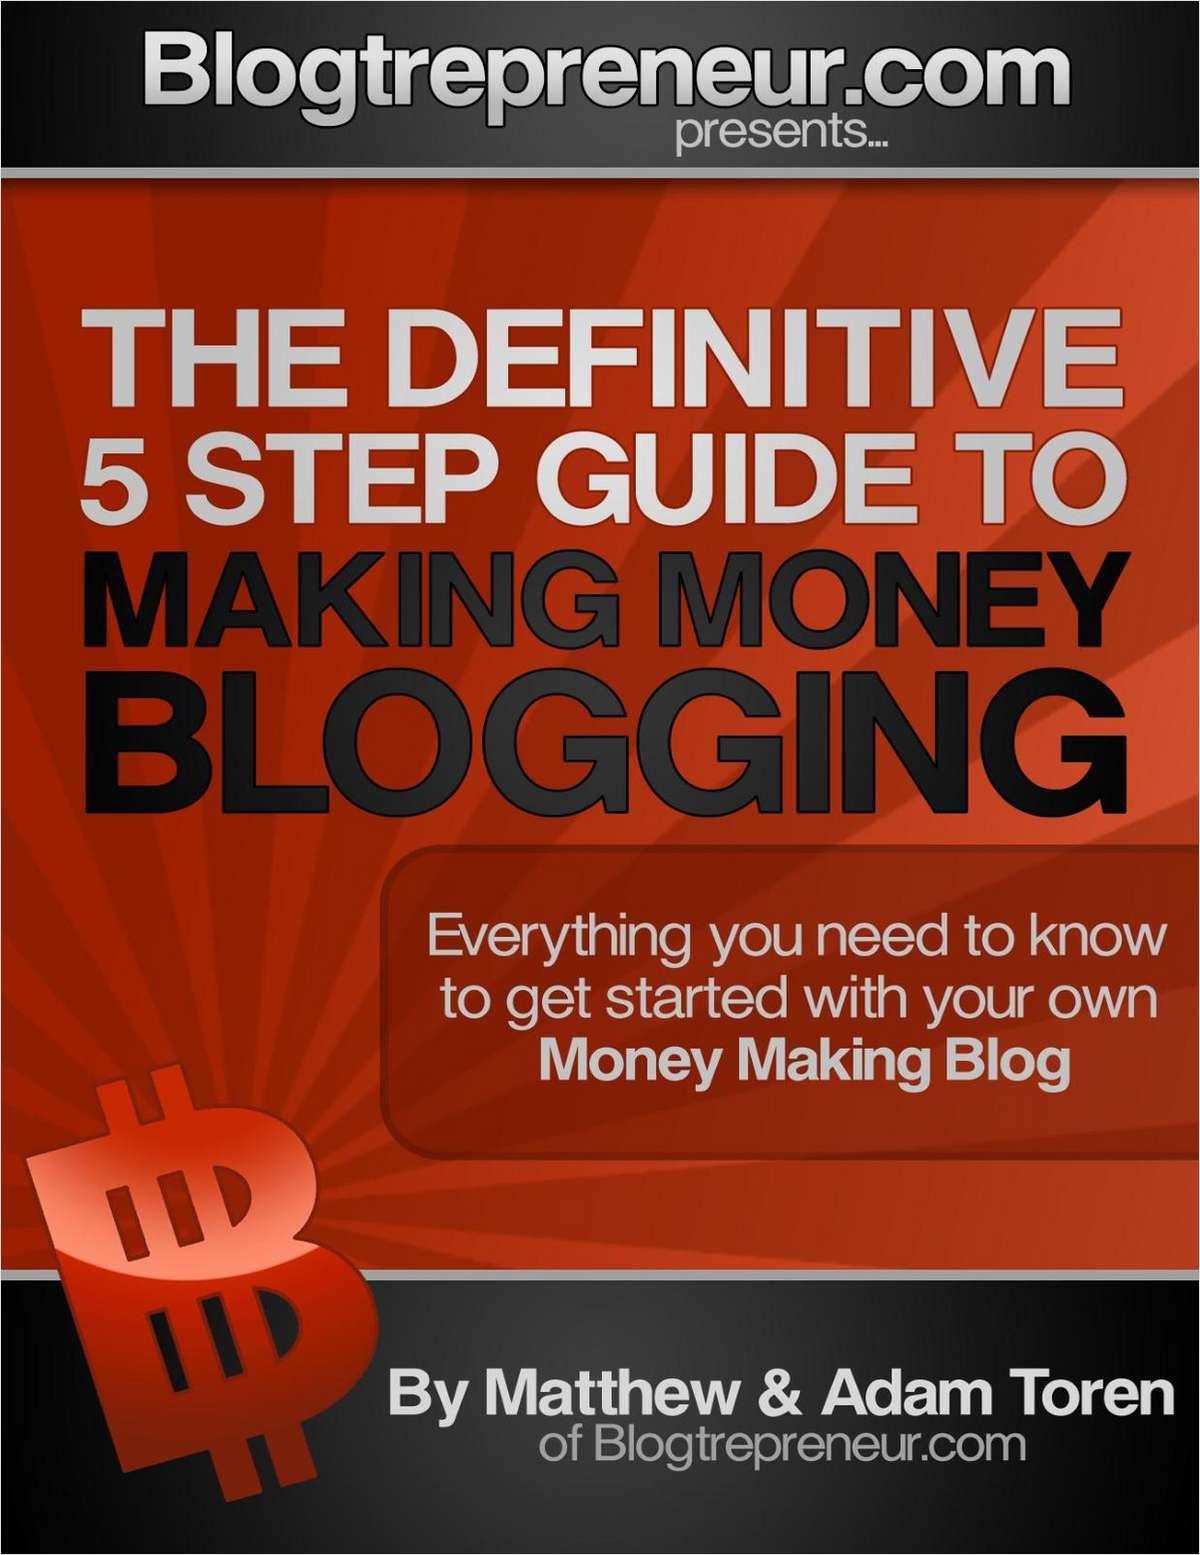 Blogtrepreneur.com: The Definitive 5-Step Guide to Make Money Blogging